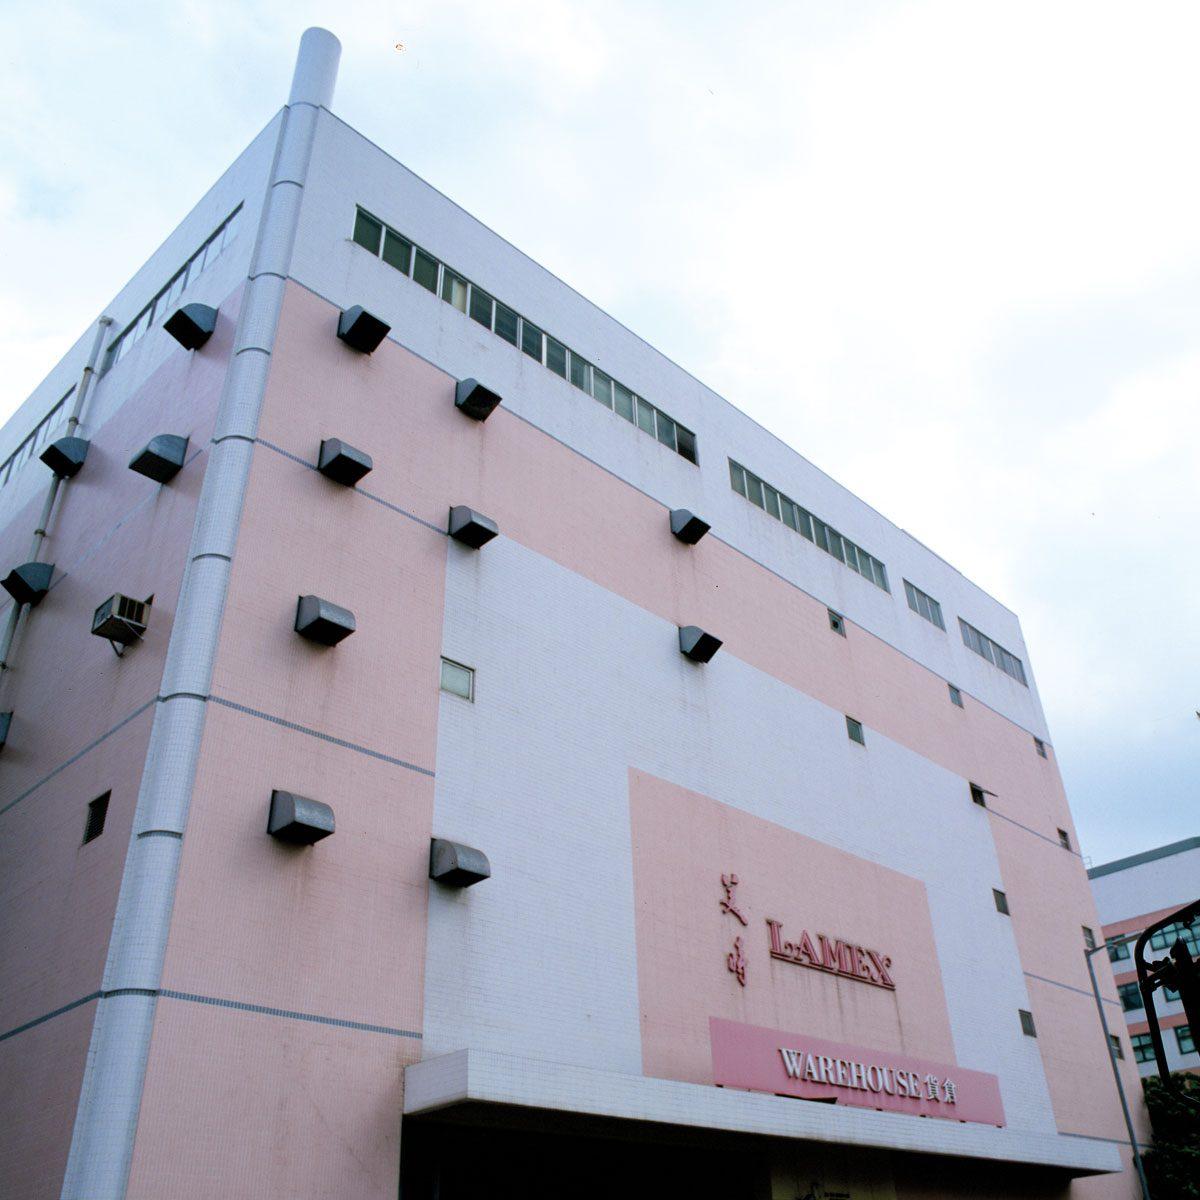 Lamex Warehouse at 28 On Chuen Street, On Lok Tsuen, Fanling, New Territories